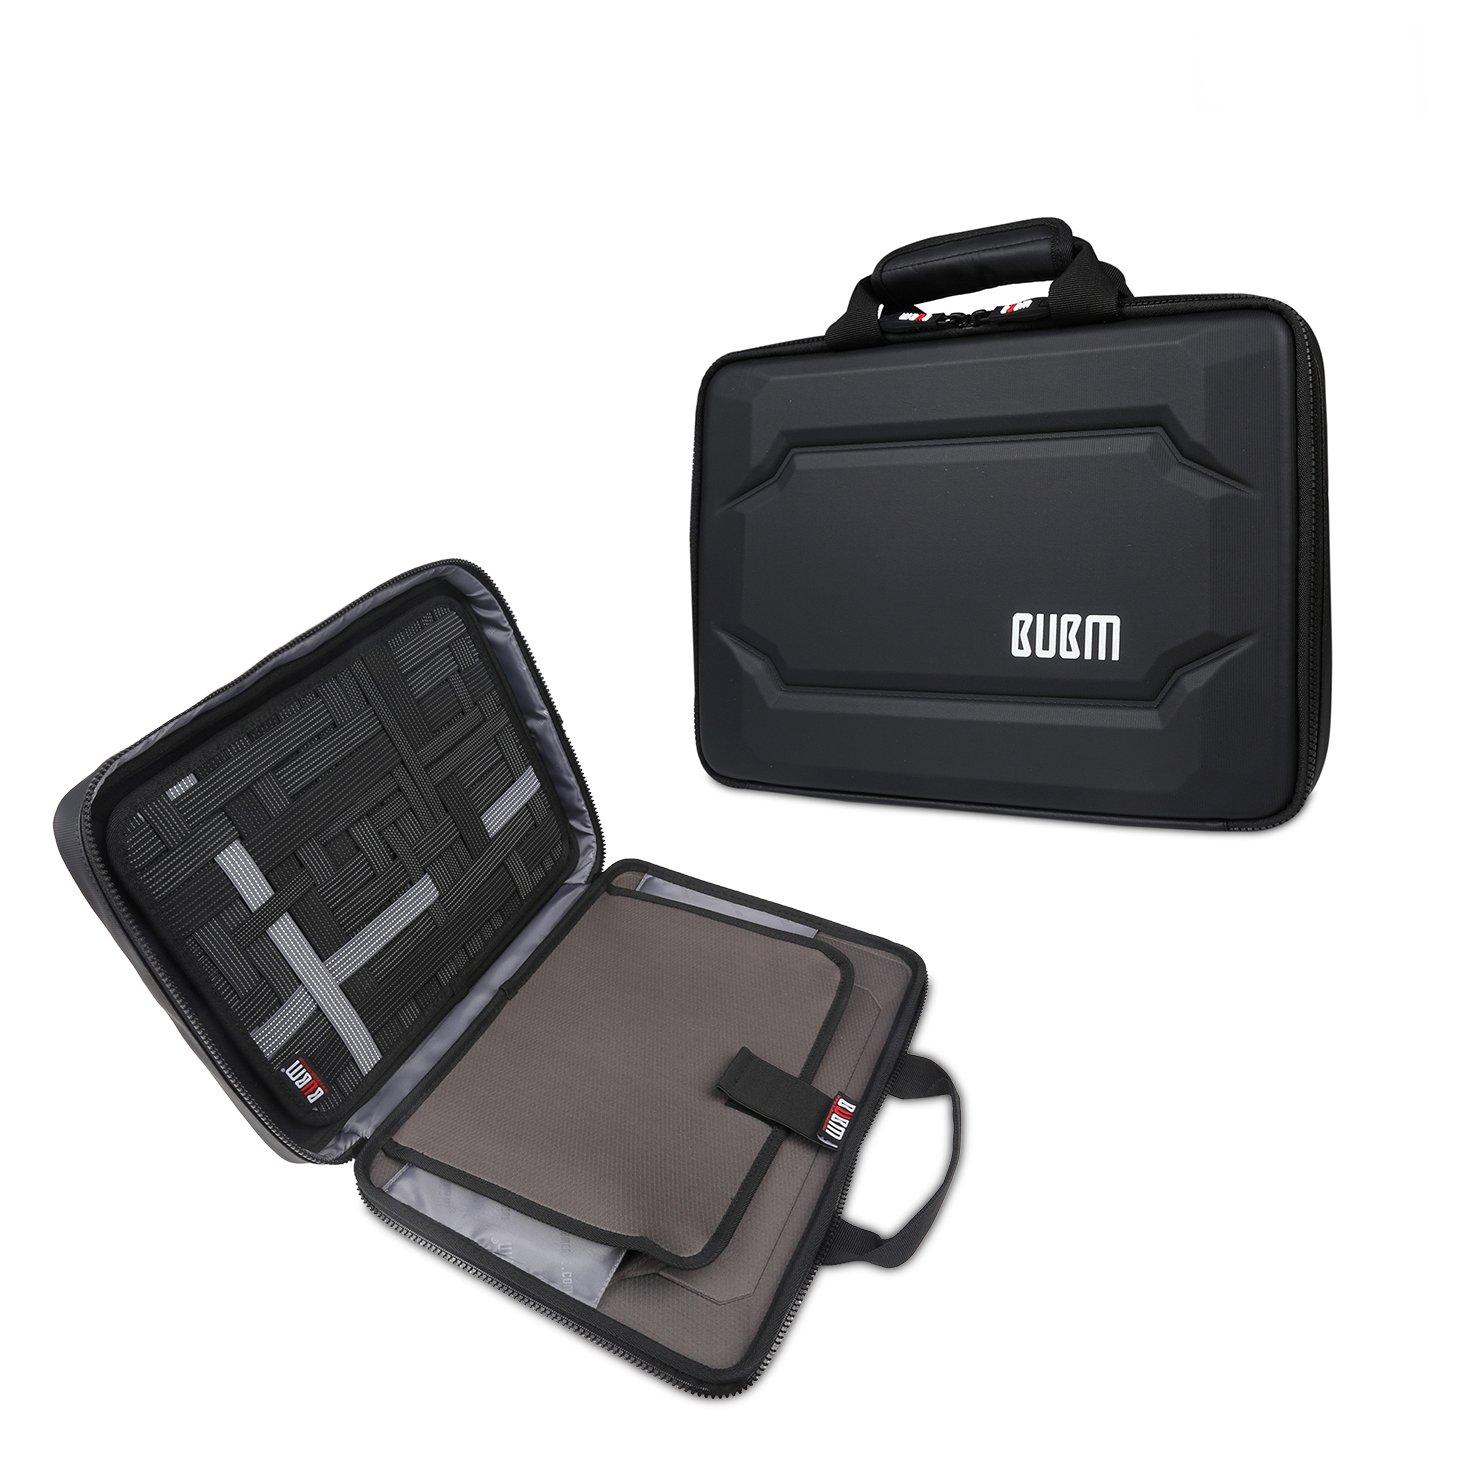 Travel Laptop Messenger Bag - BUBM 13.3 inch Laptop Briefcase Shoulder Bag Waterproof & Shockproof Carrying Case Hard Shell Laptop Sleeve for 13.3 MacBook,Notebook Computer,Black (13.3 inch-1 Layer)